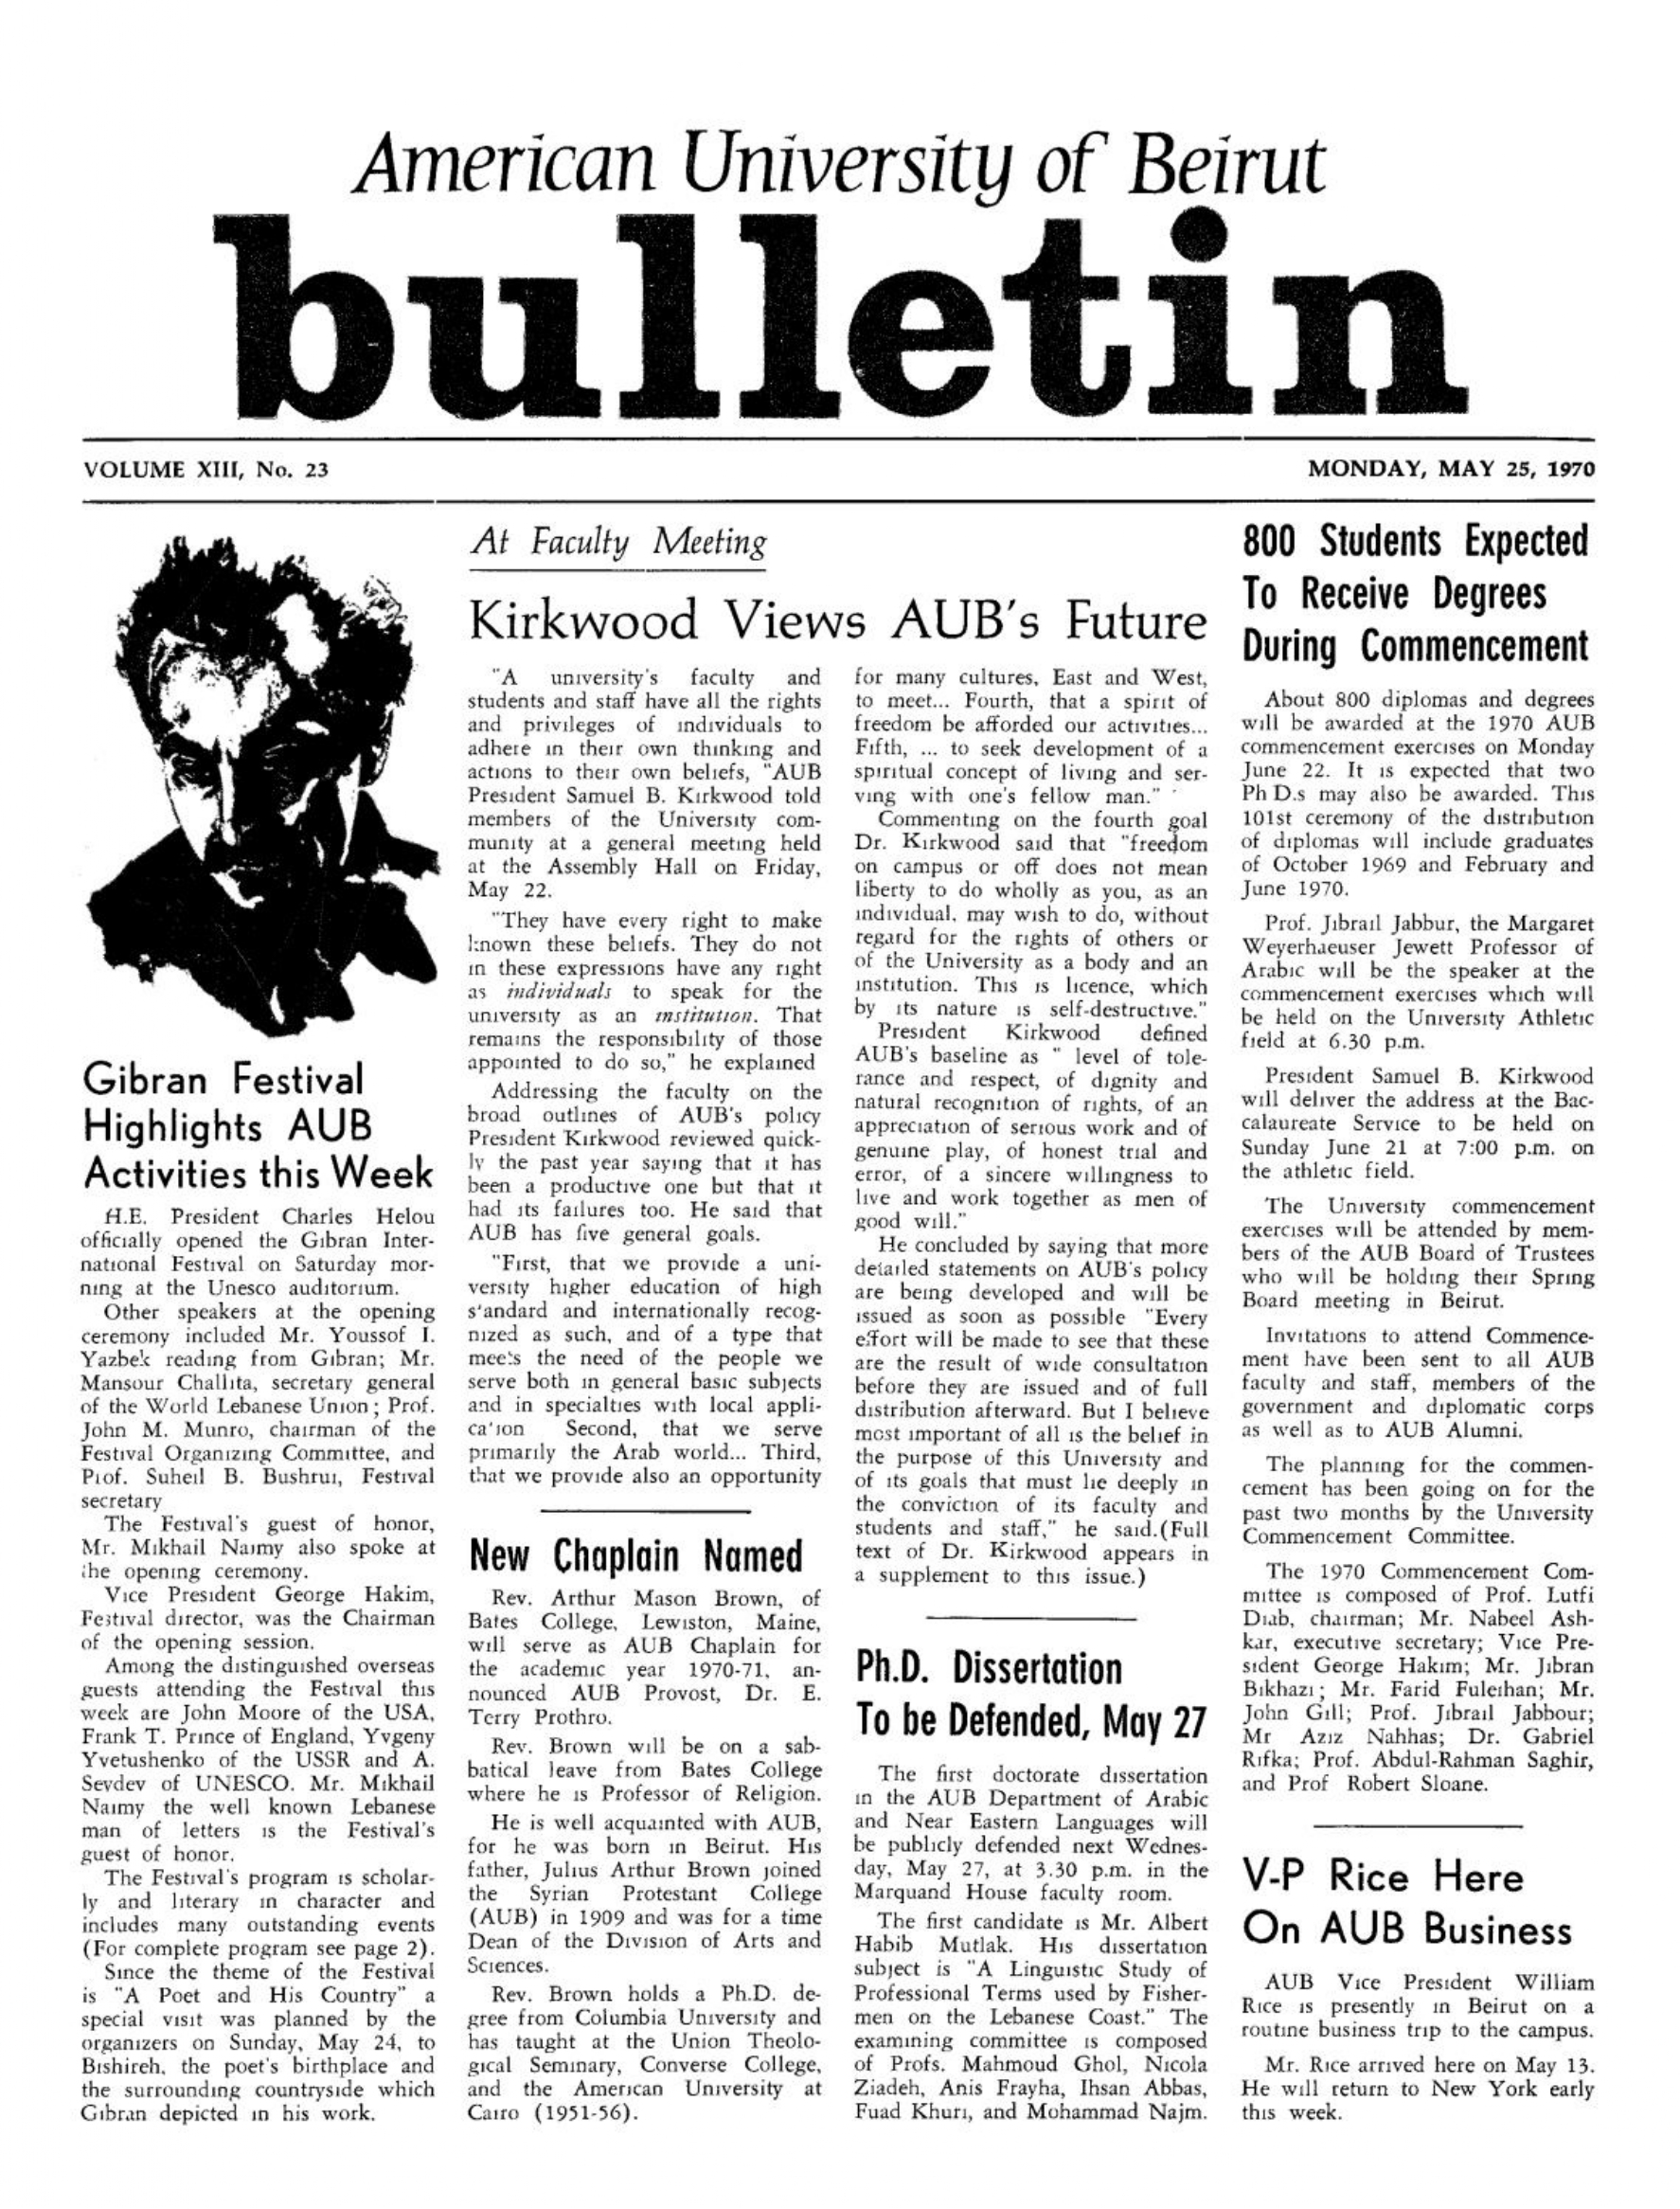 On Gibran International Festival (Beirut, 23-30 May 1970), American University of Beirut Bulletin, 13, 22, May 13, 1970.